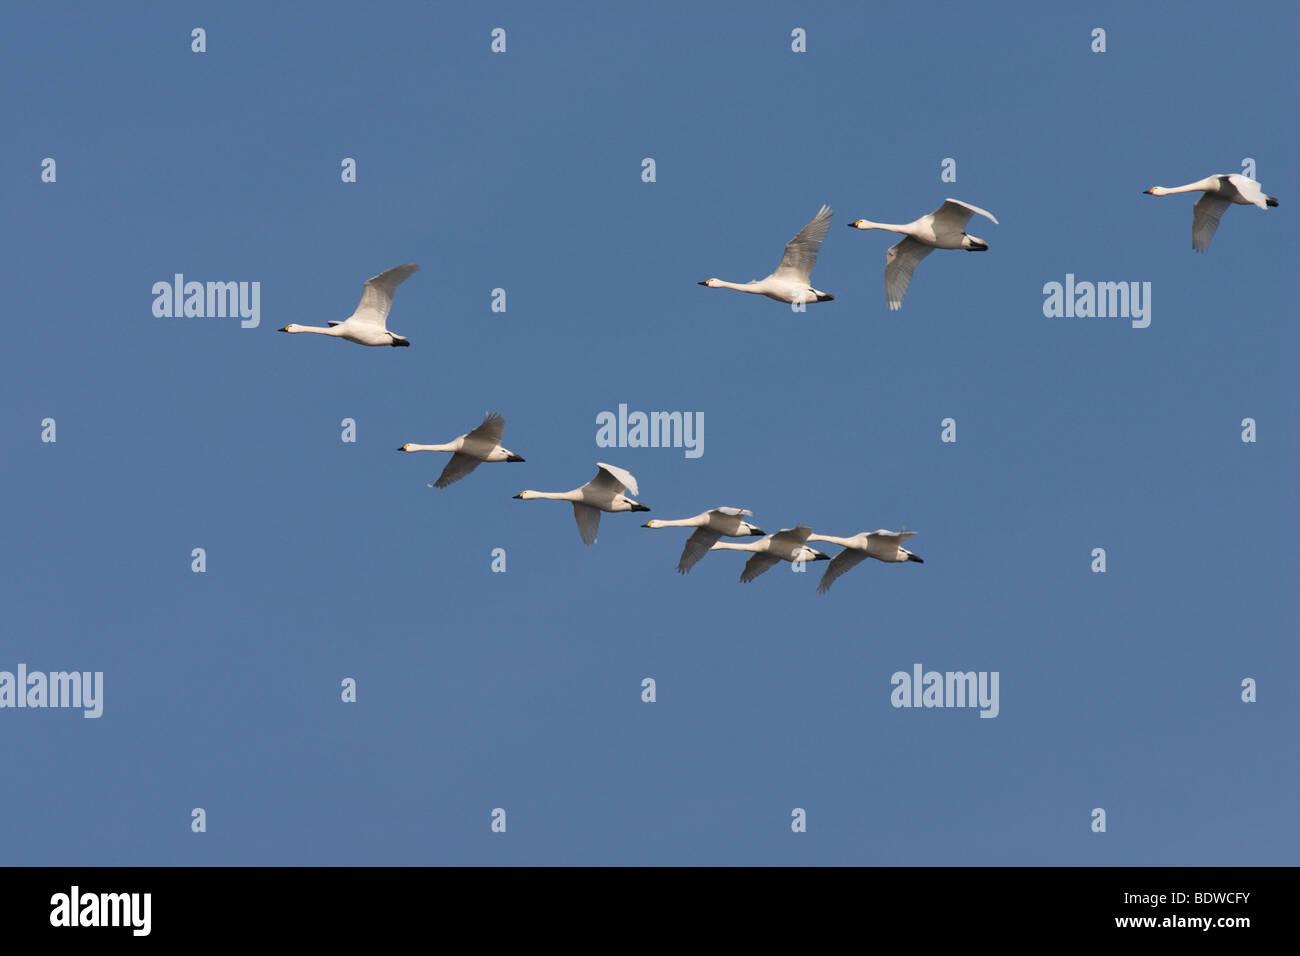 Flock of Tundra Swans (Cygnus bewickii), flying, Naturschutzgebiet Wuemmewiesen nature reserve, Bremen, Germany, Stock Photo